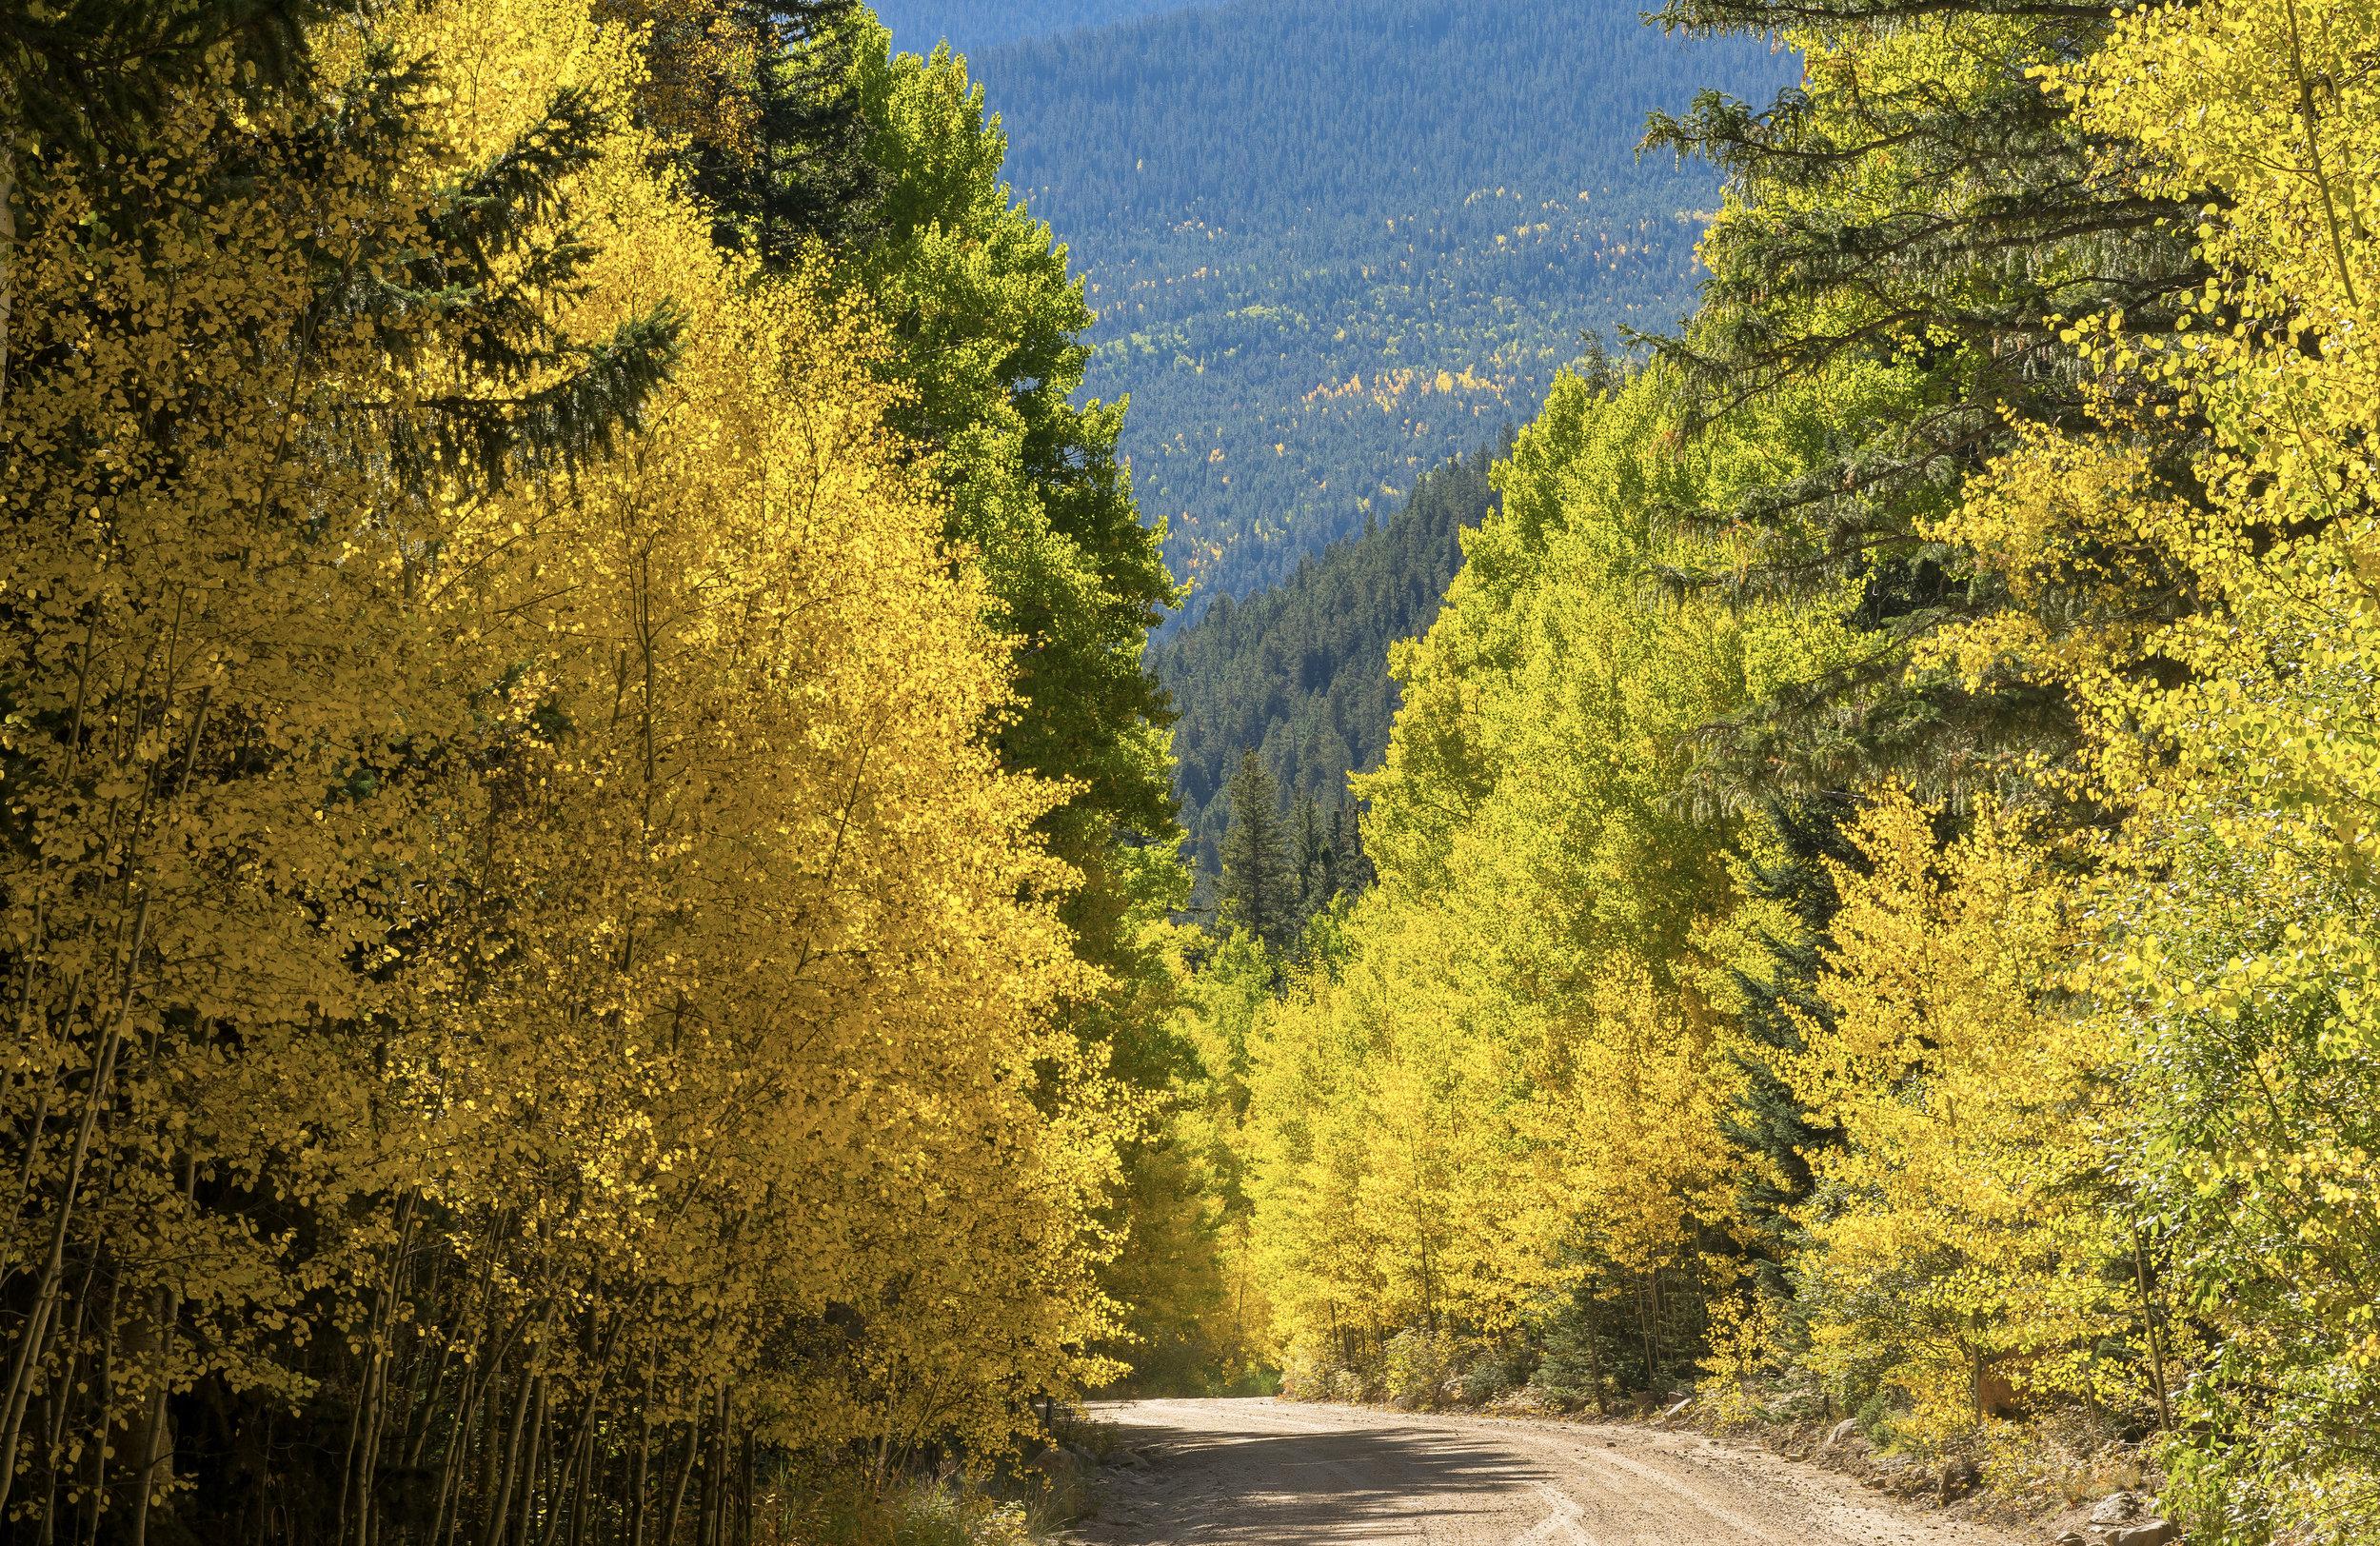 Guenella Pass Area, Colorado - image by FRANKIEBOYPHOTOGRAPHY.COM